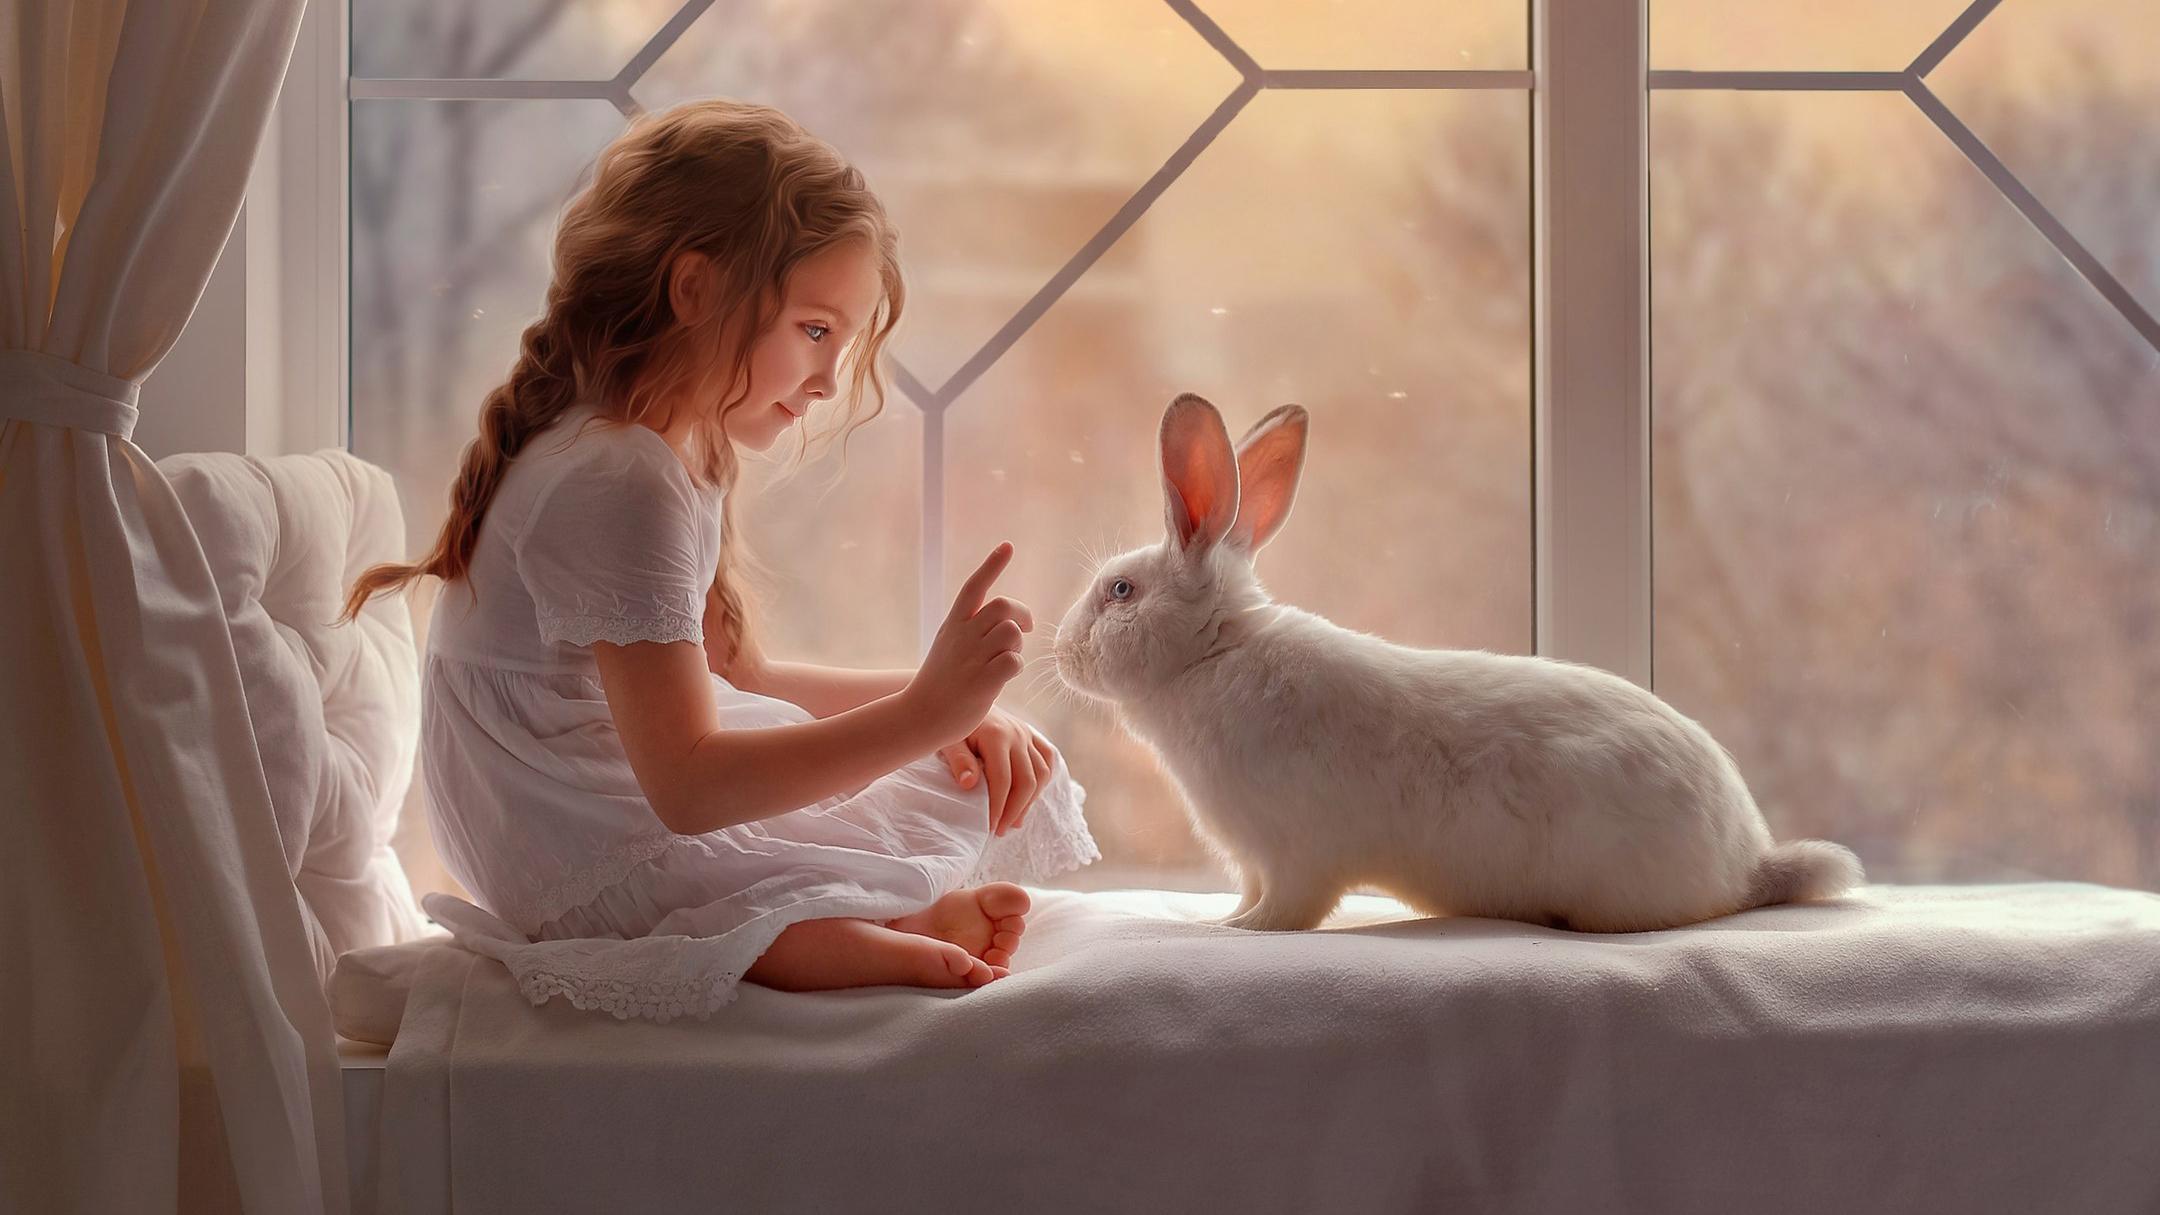 Cute Baby Love Hd Wallpaper Download Cute Girl And Rabbit Wallpapers Hd Wallpapers Id 26613